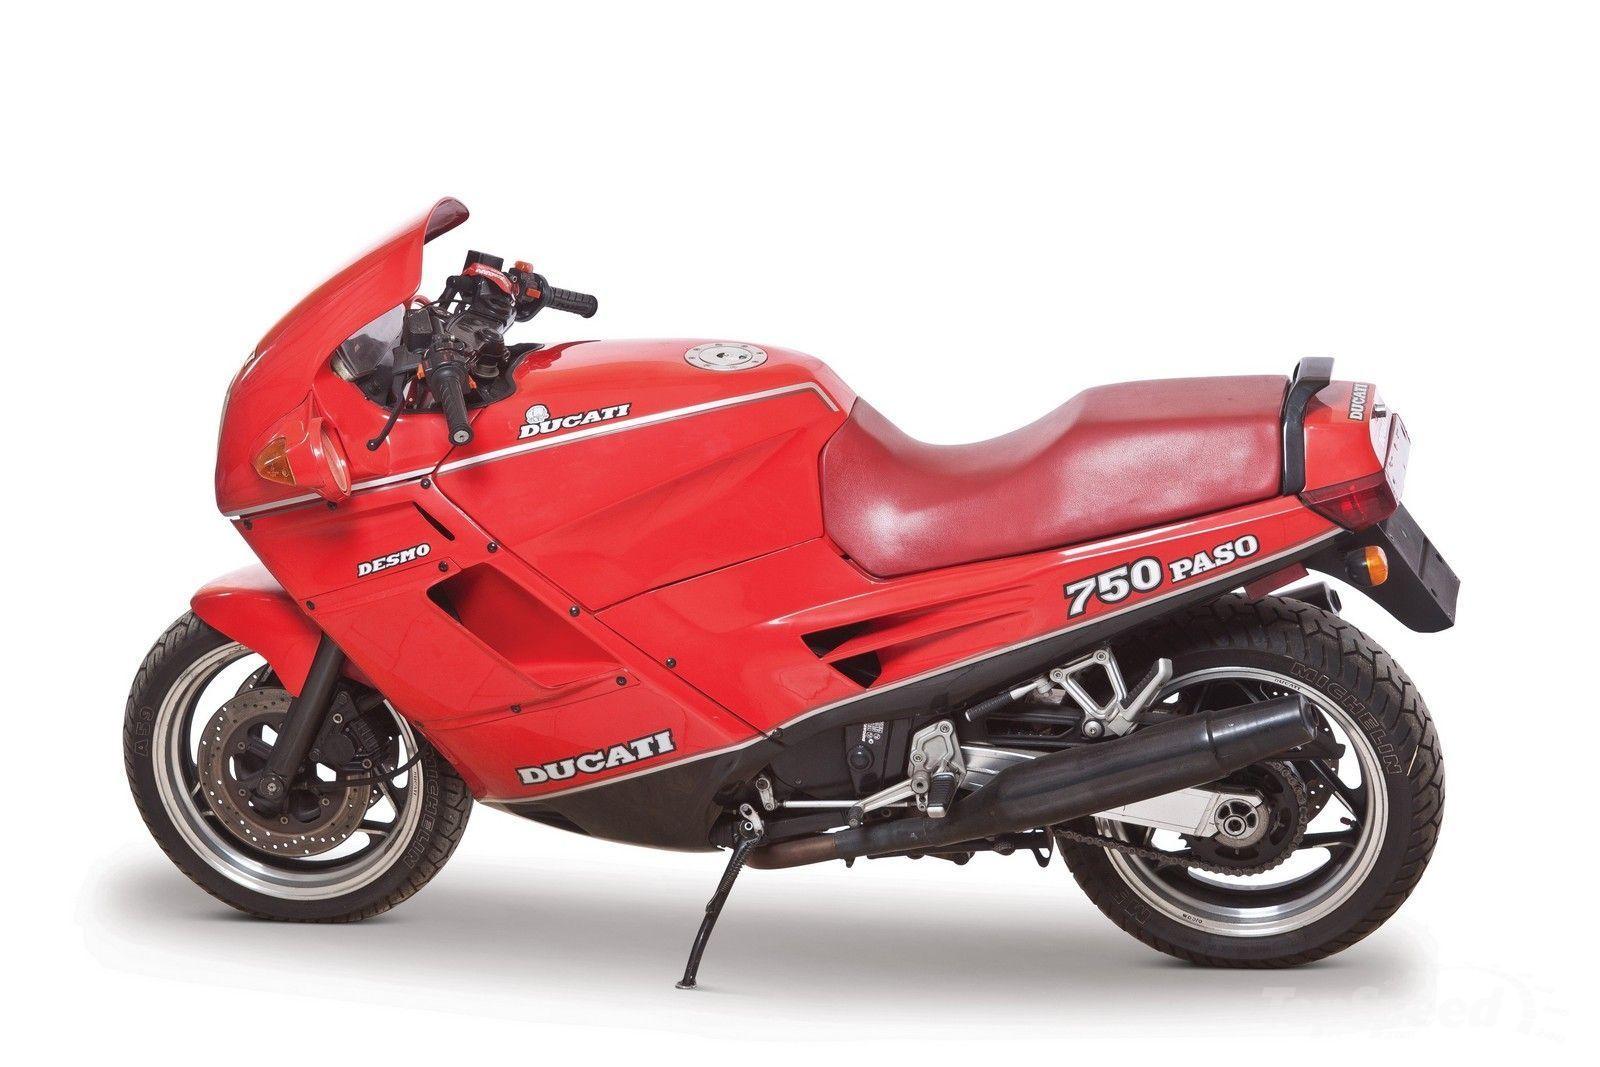 Ducati Superleggera For Sale South Africa